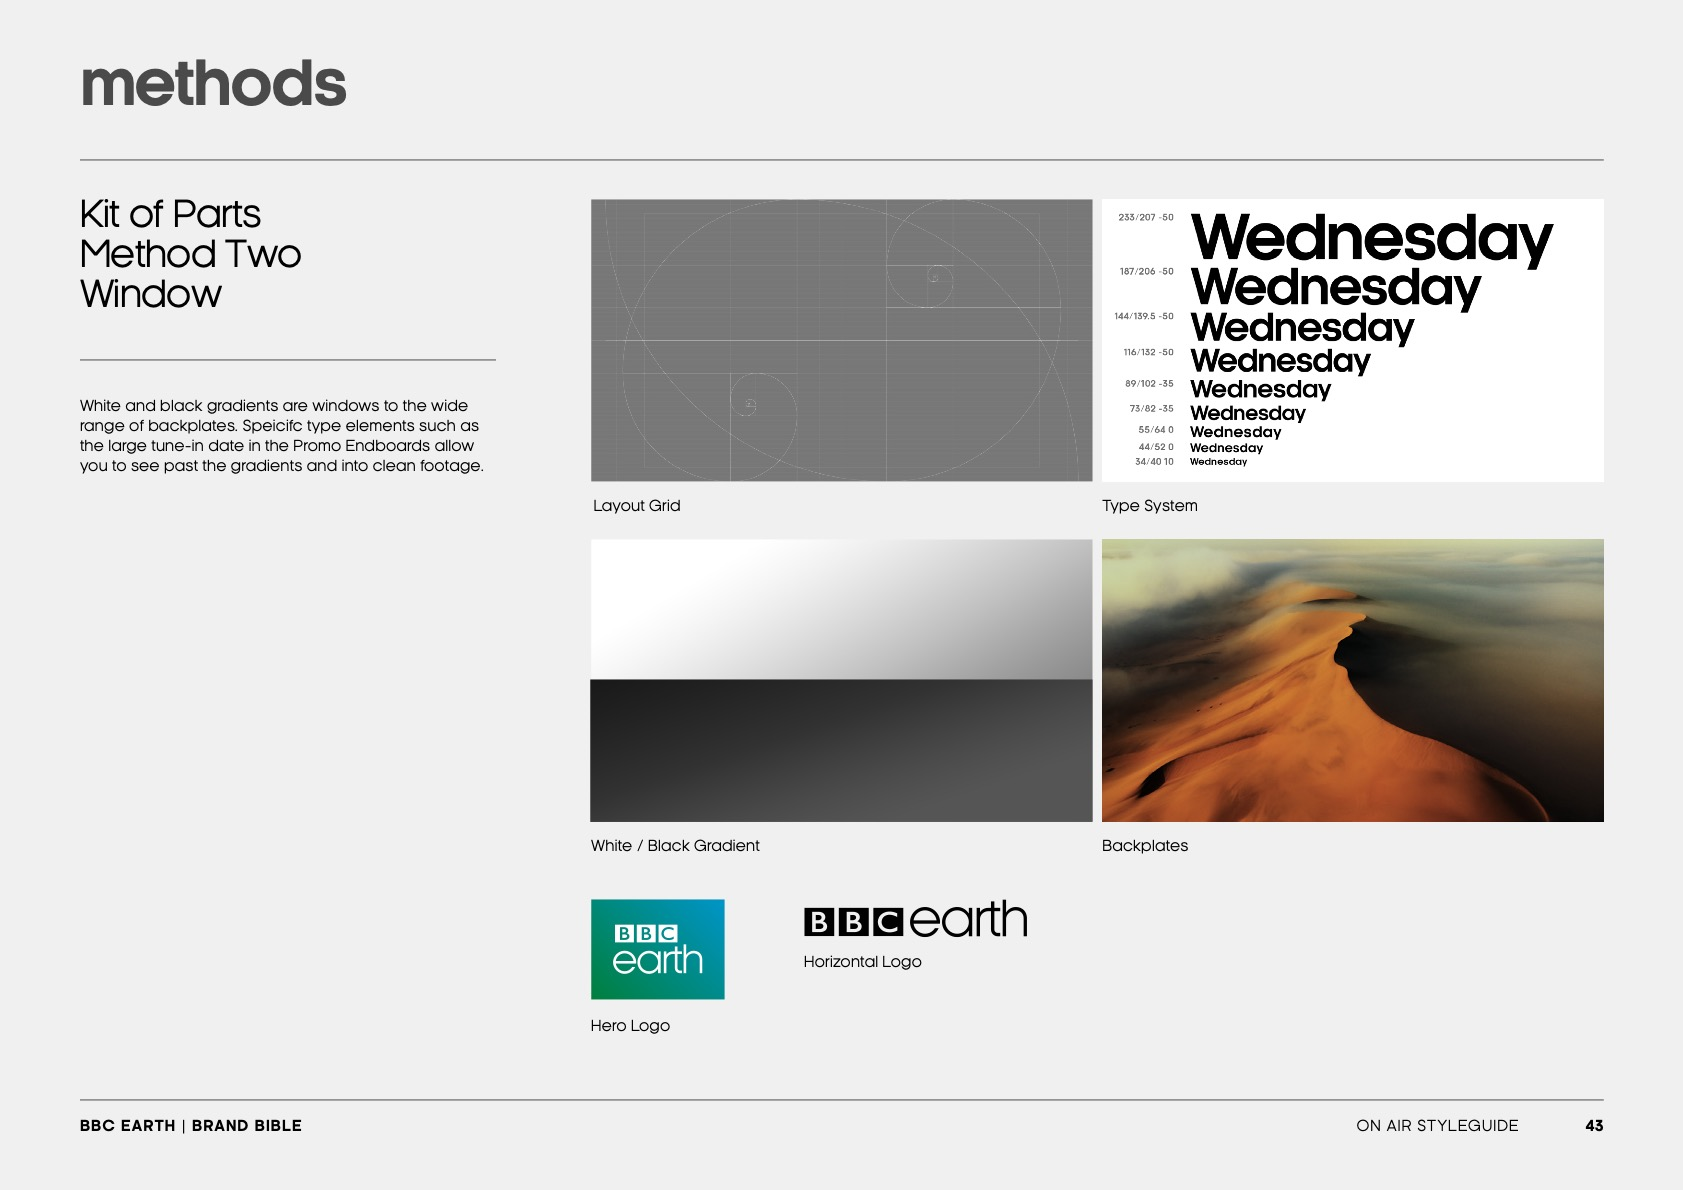 160208_BBC_Earth_Styleguide_Book_00_pa 43.jpeg